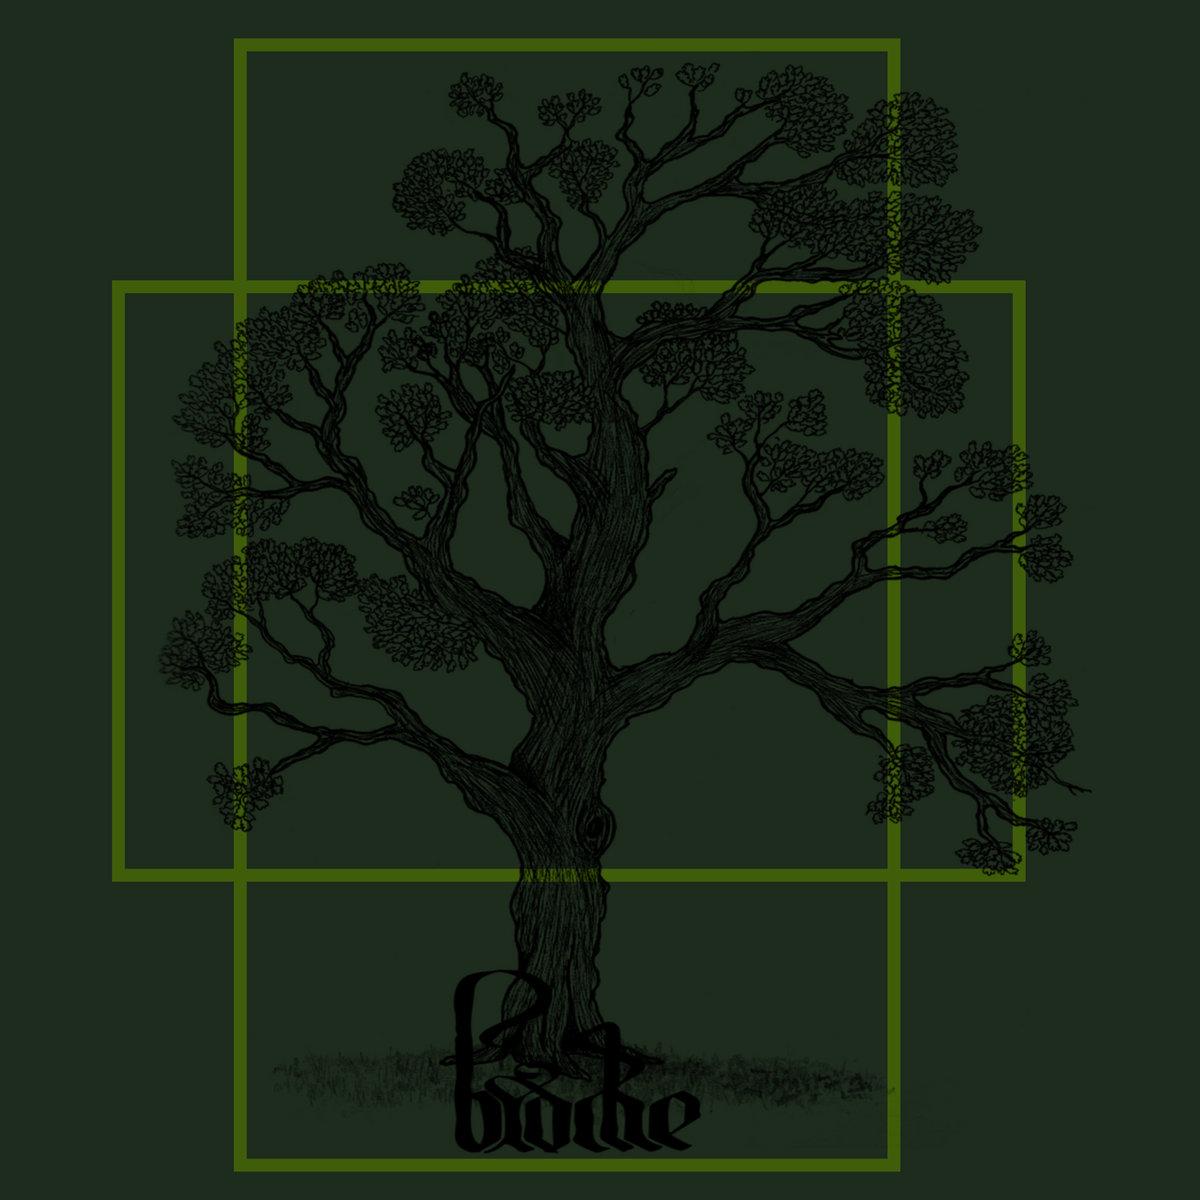 https://brache.bandcamp.com/